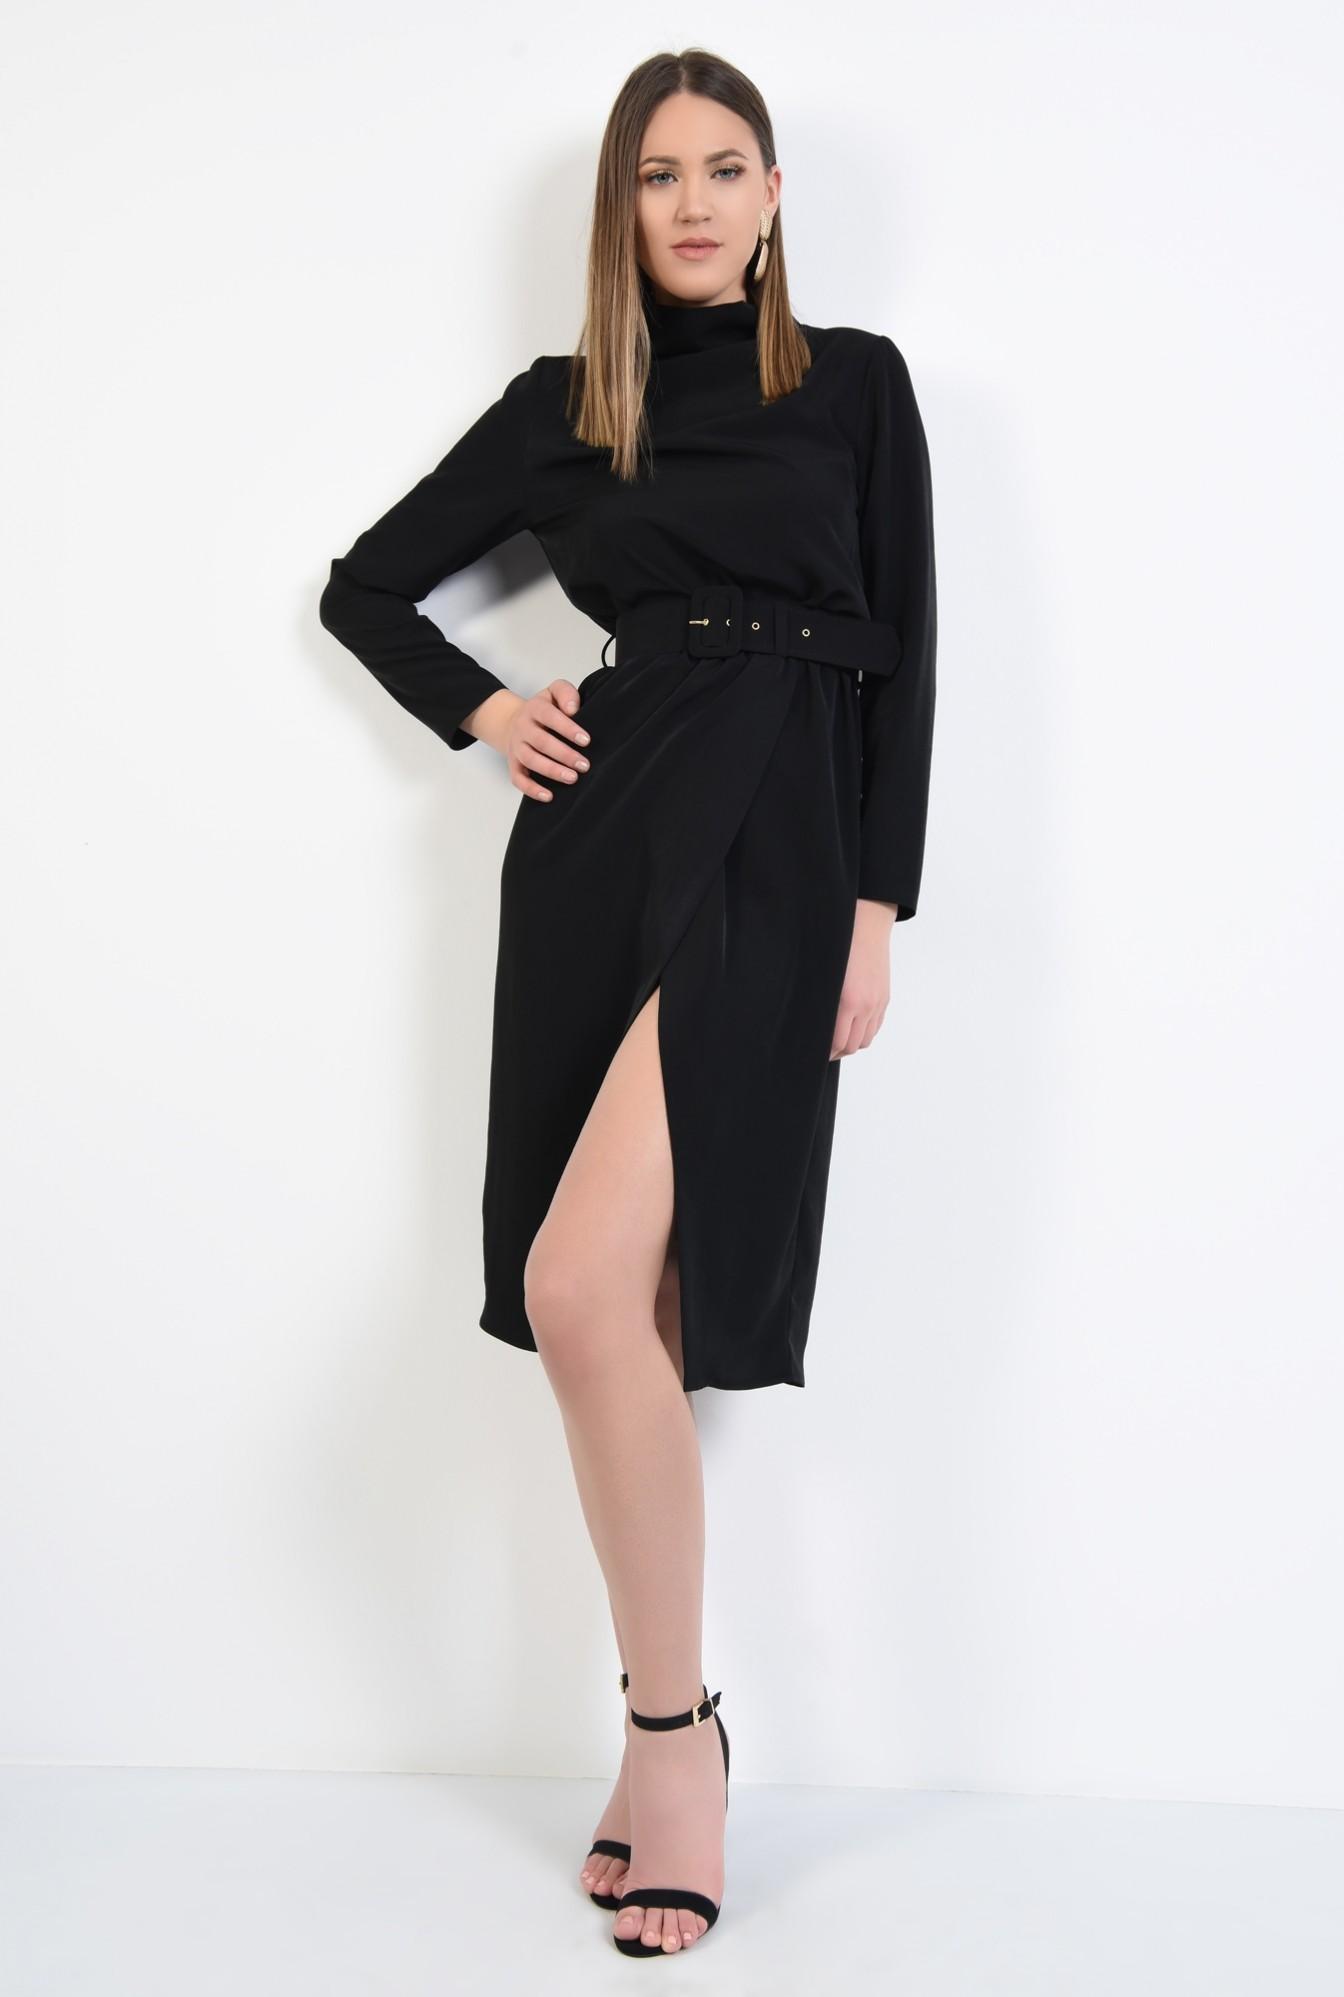 2 - rochie neagra, de zi, croi cambrat cu elastic, maneci lungi